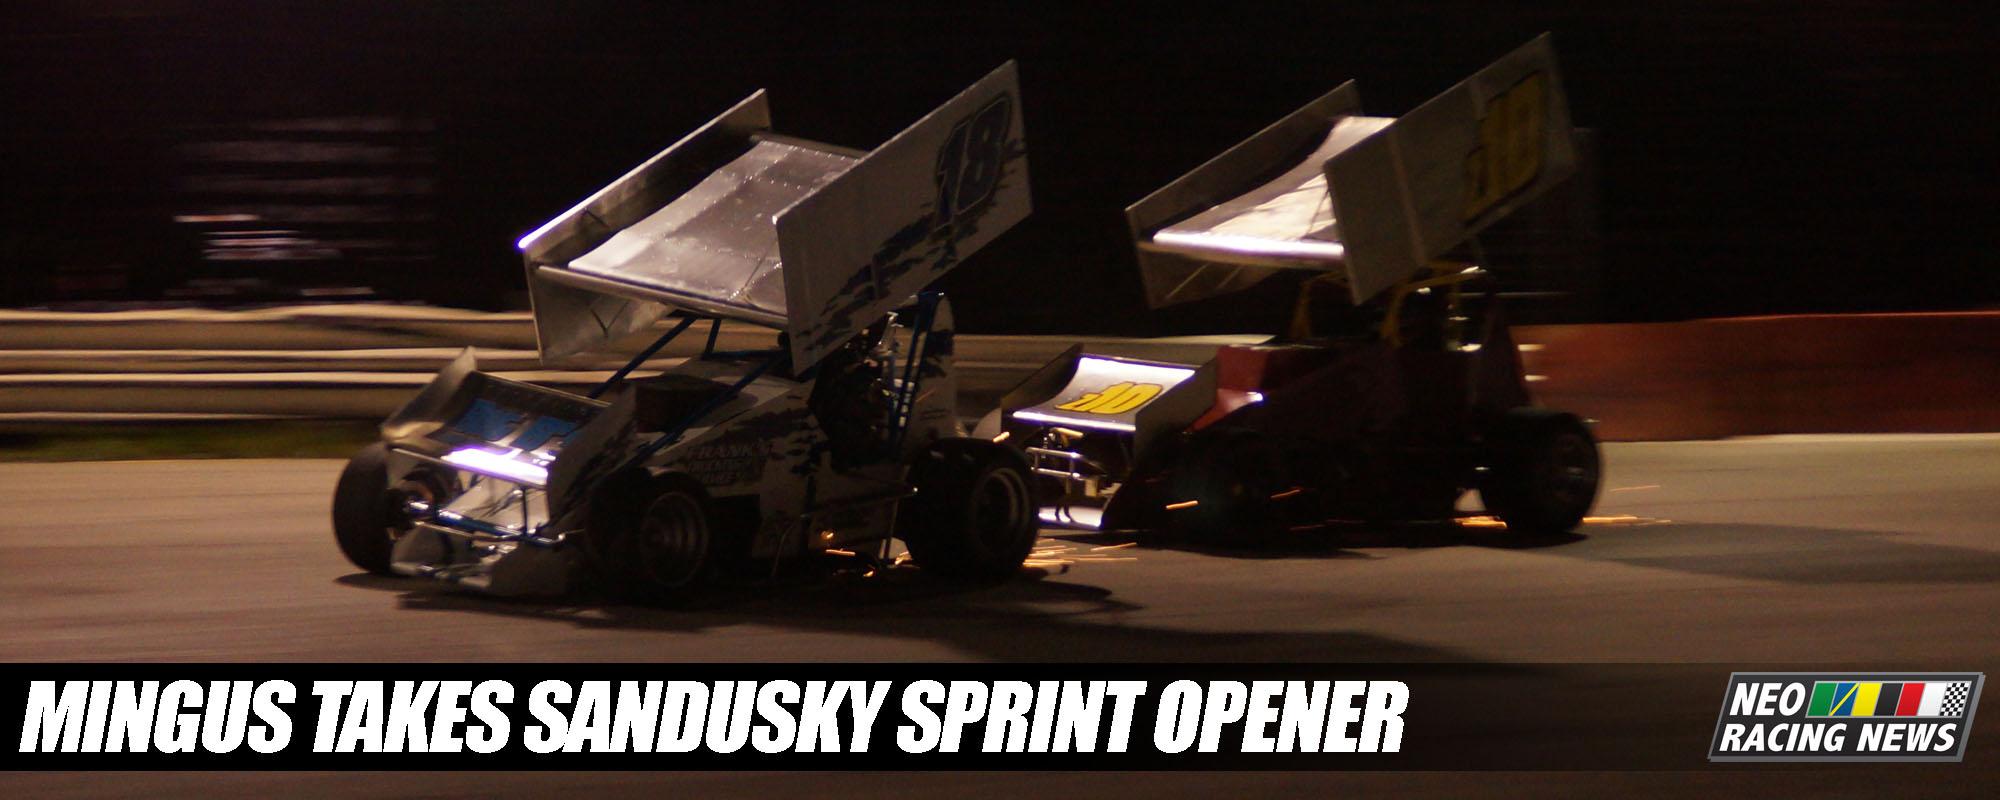 PHOTOS: Sandusky Speedway Opener